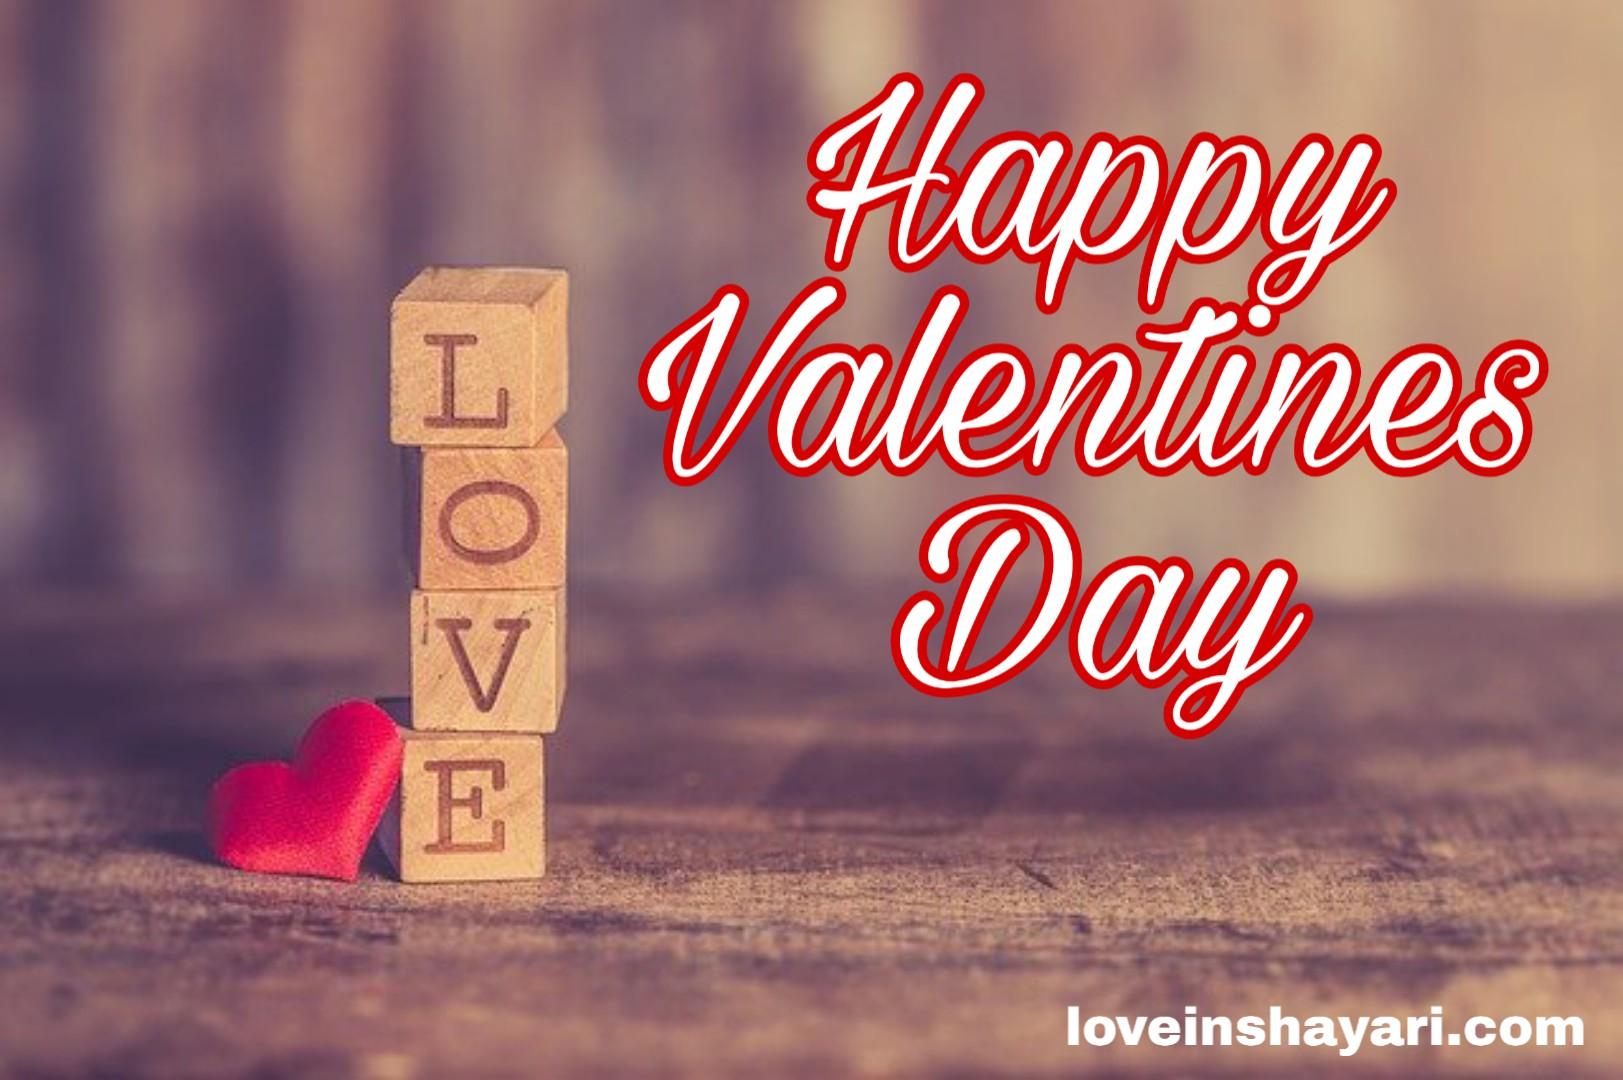 Photo of Valentine's day 2021 images, shayari, wishes, sms